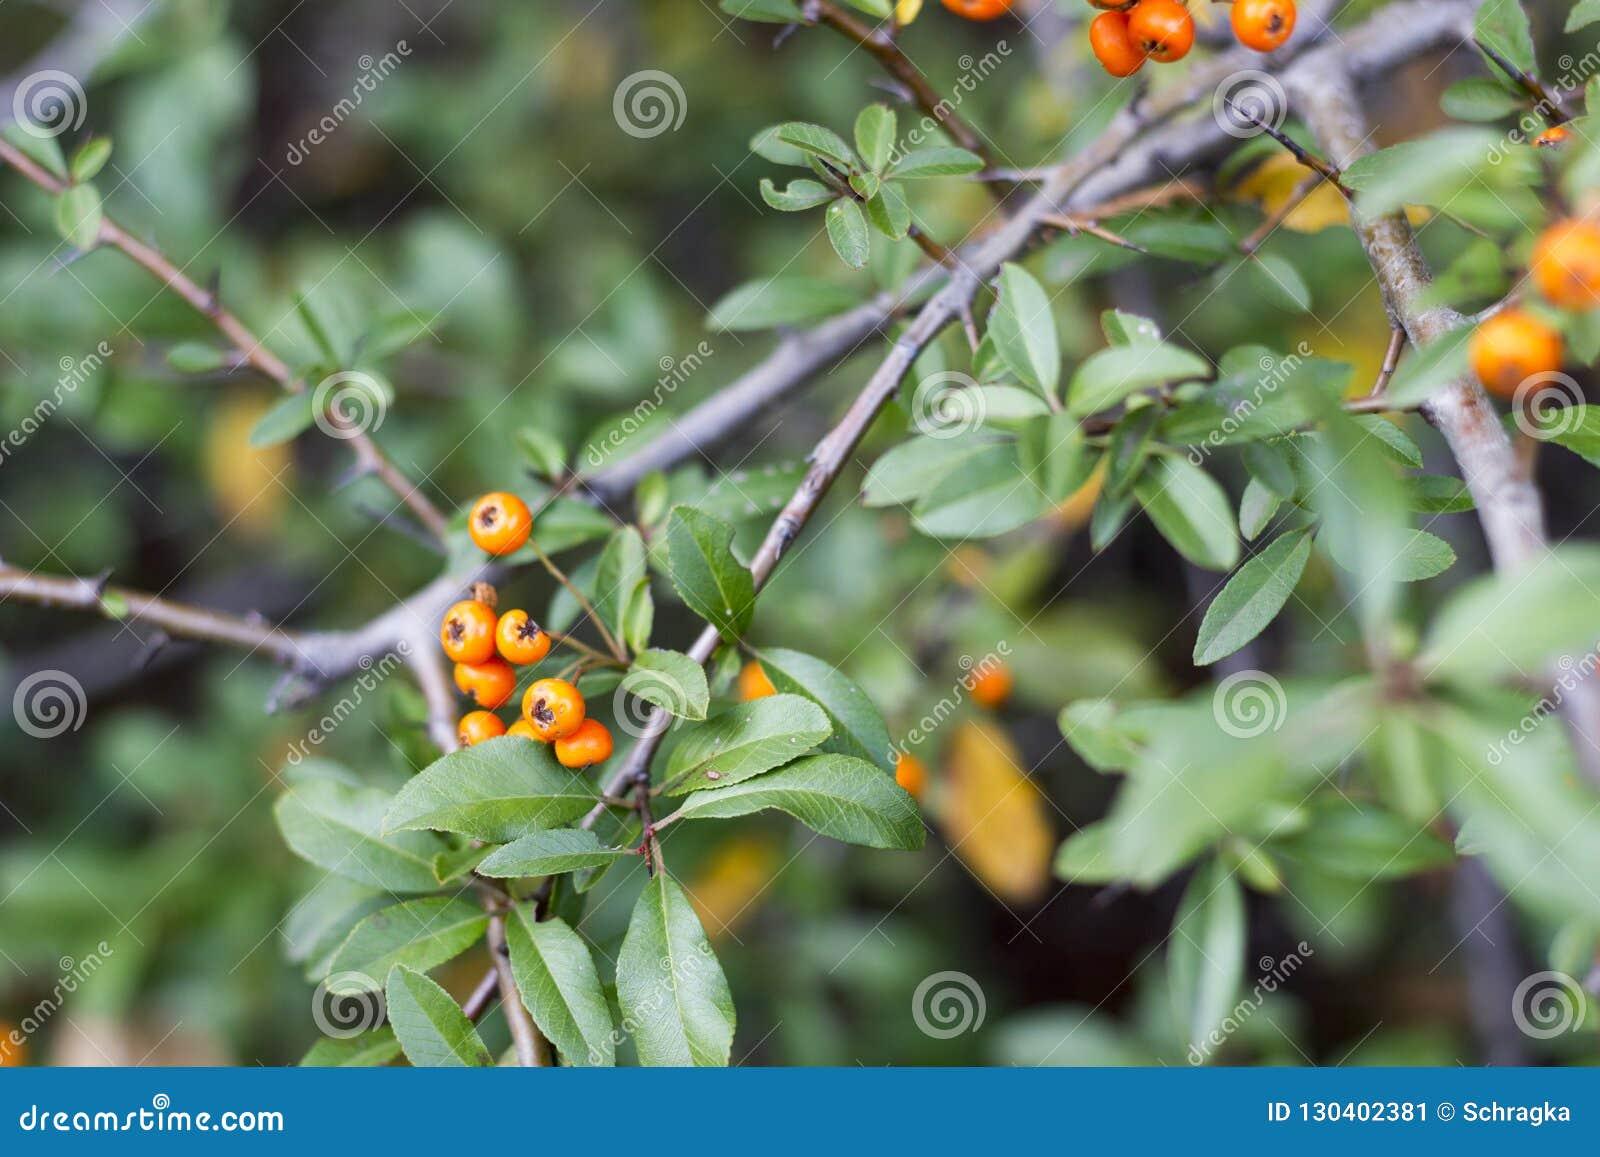 Horizontal Photo Of Fall Orange Berries On Bush Stock Image